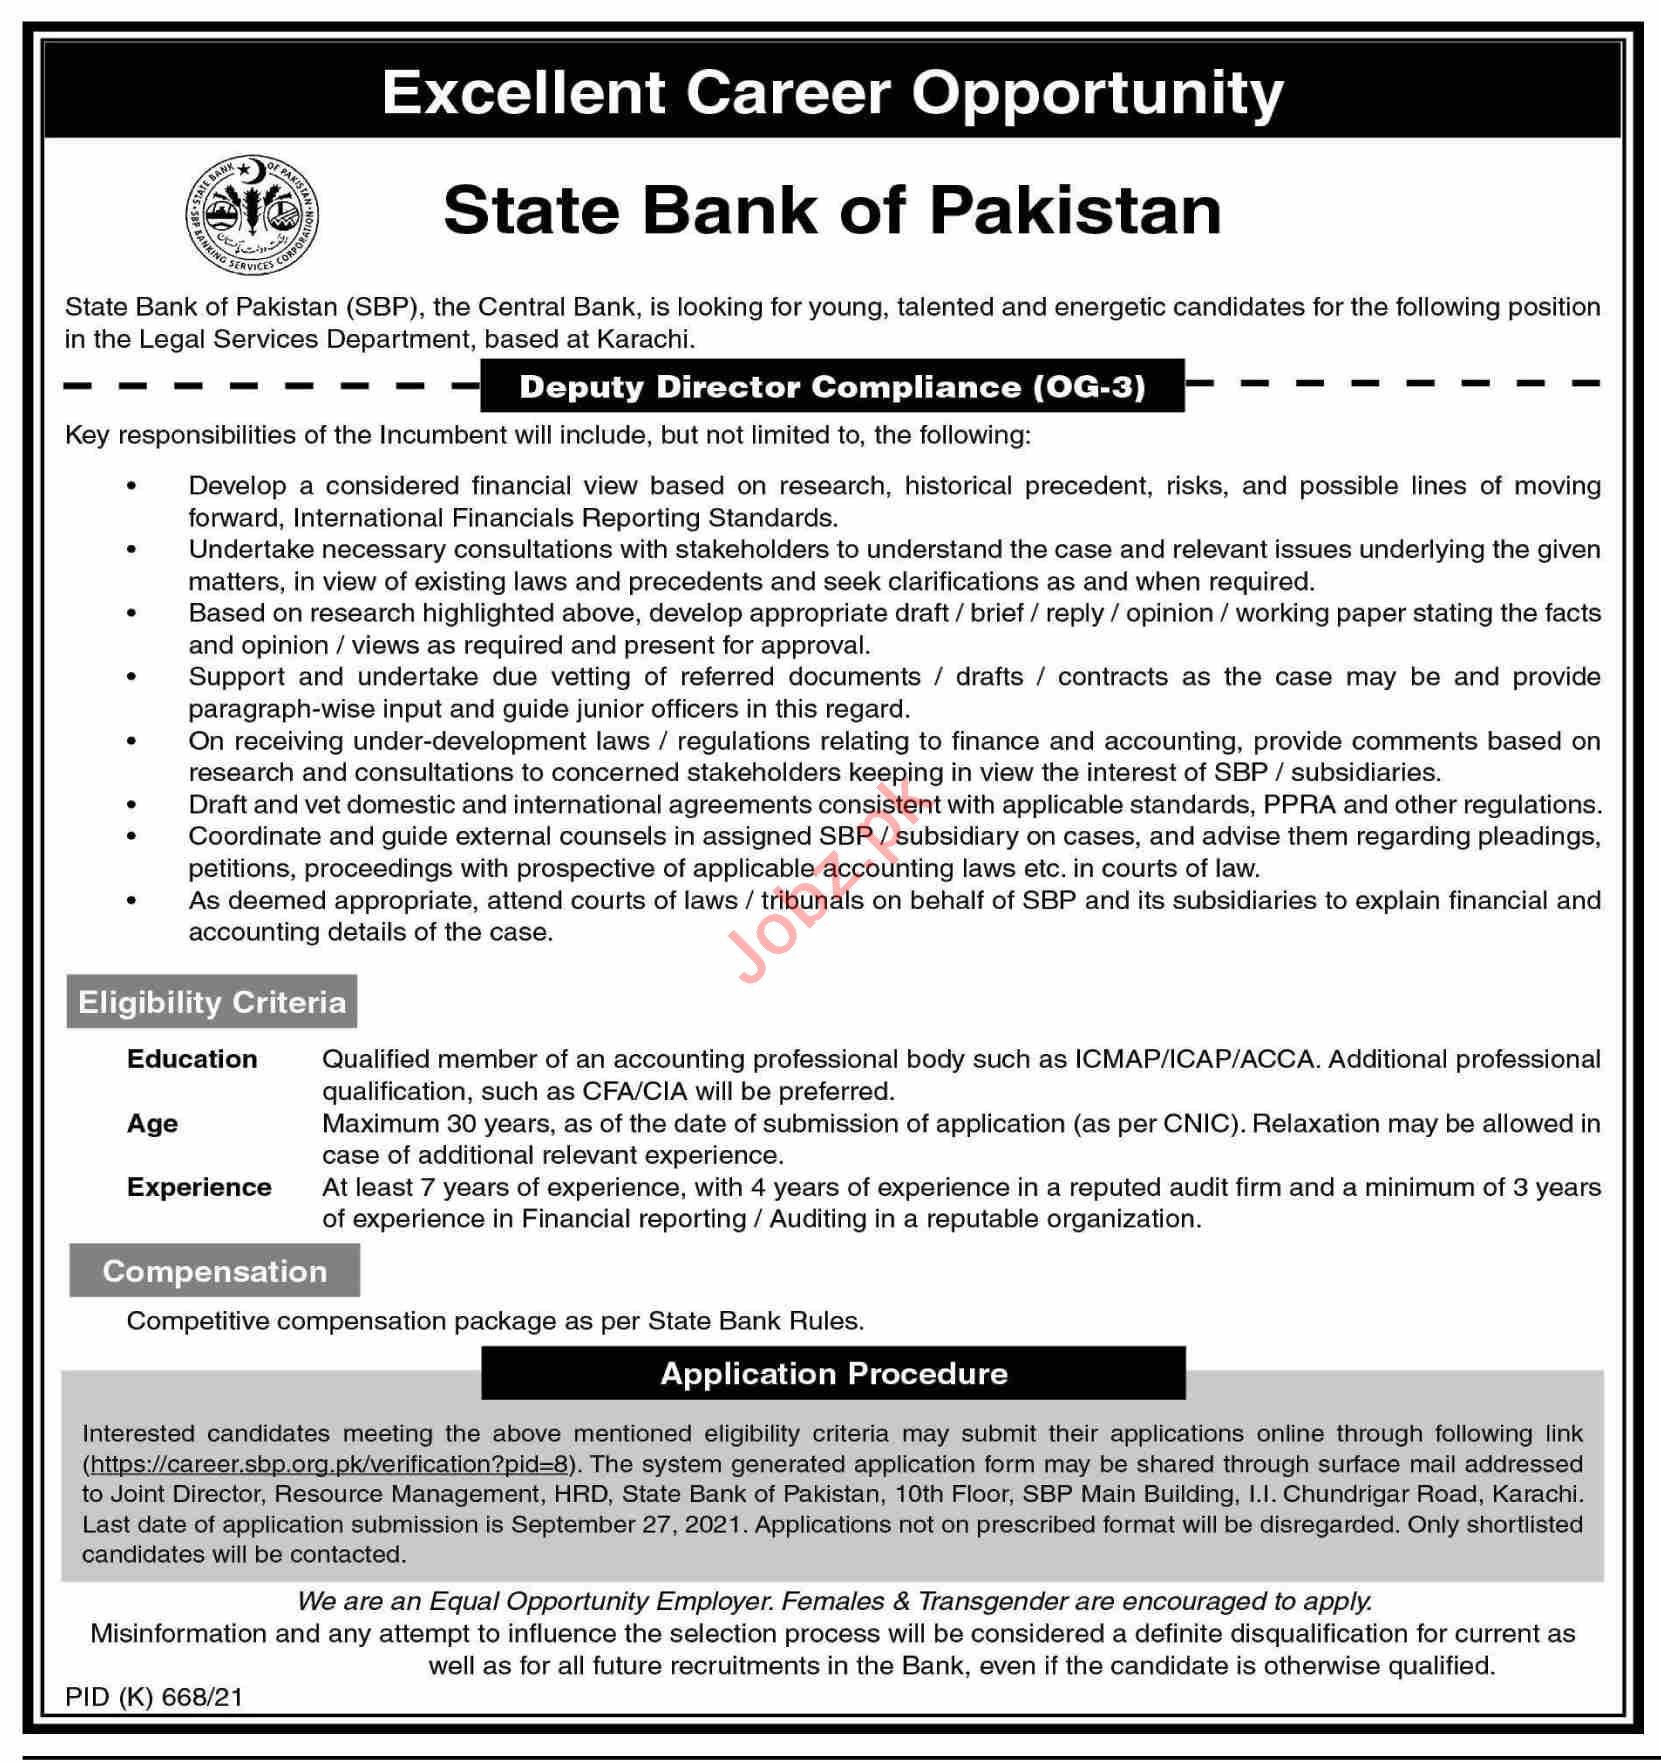 State Bank of Pakistan SBP Jobs 2021 for Deputy Director